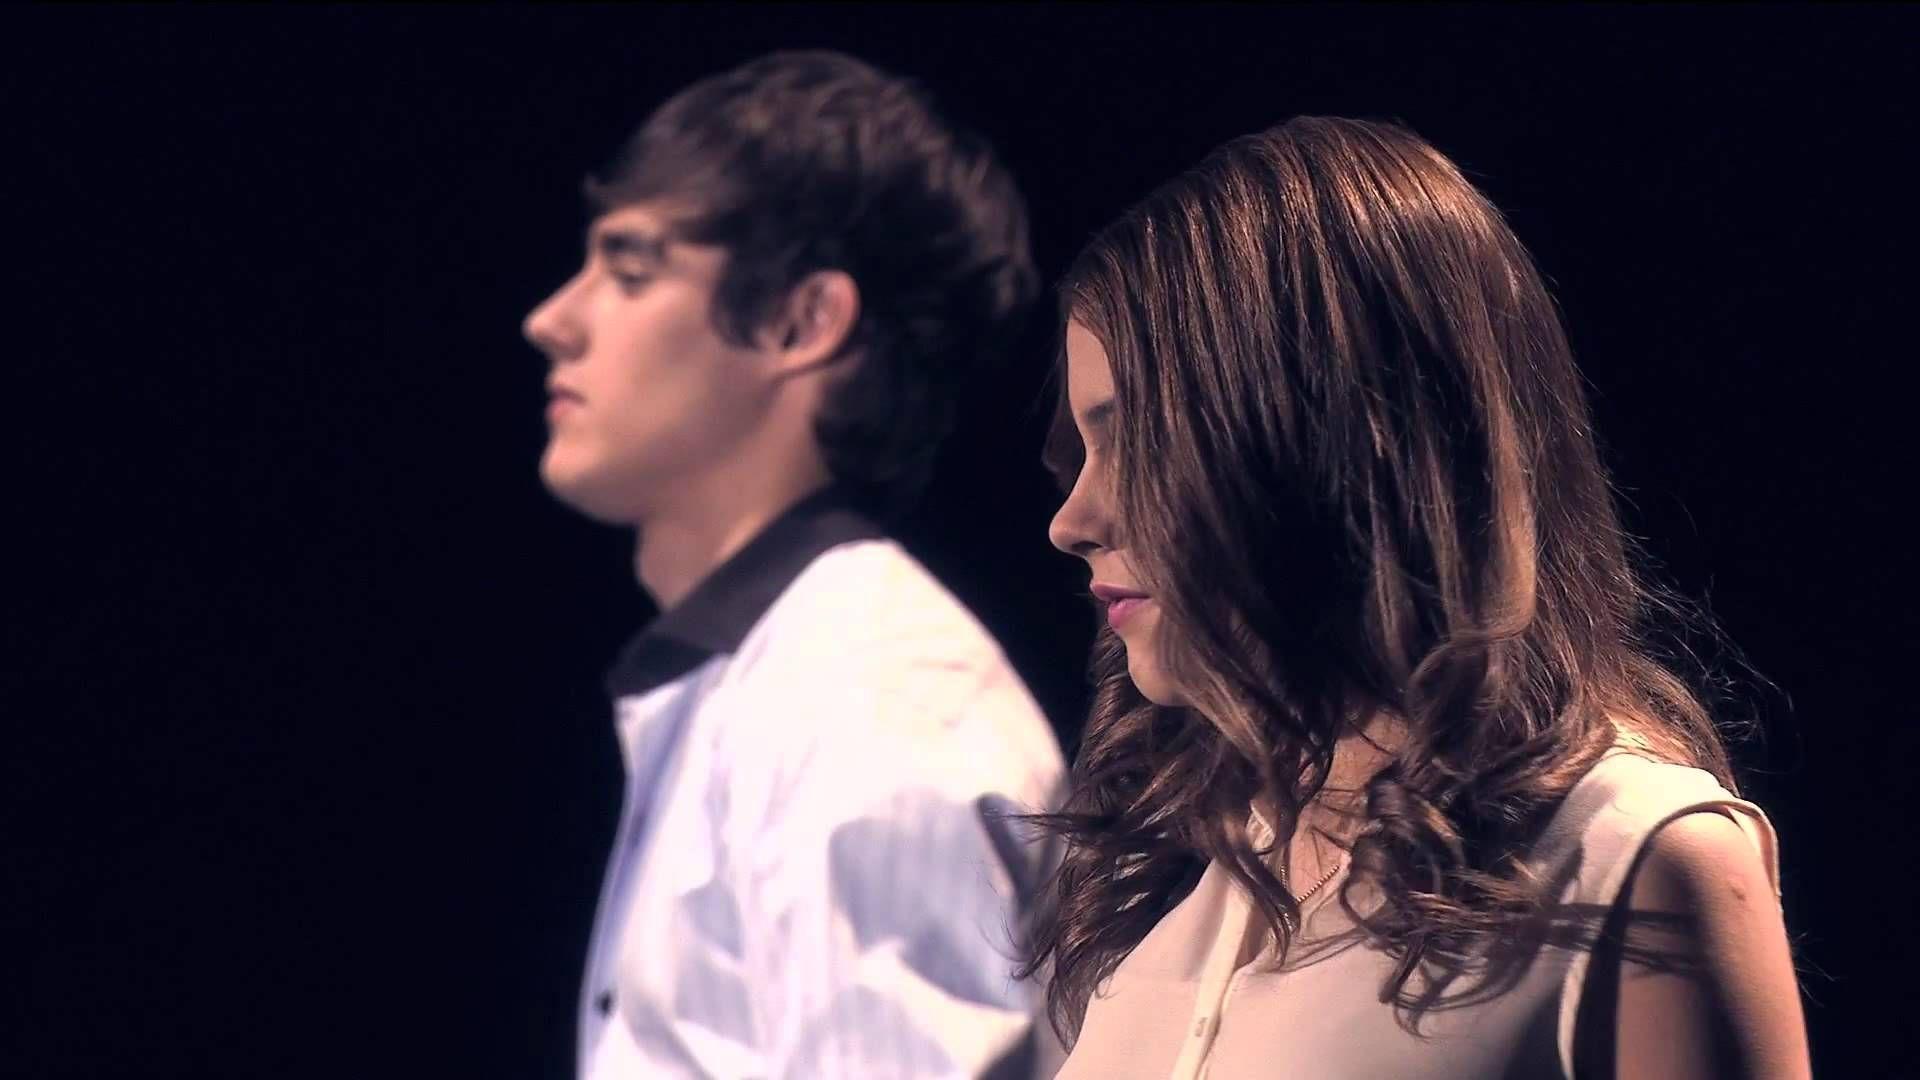 ViolettaToms y Len cantando Voy Por Ti  violetta  Pinterest